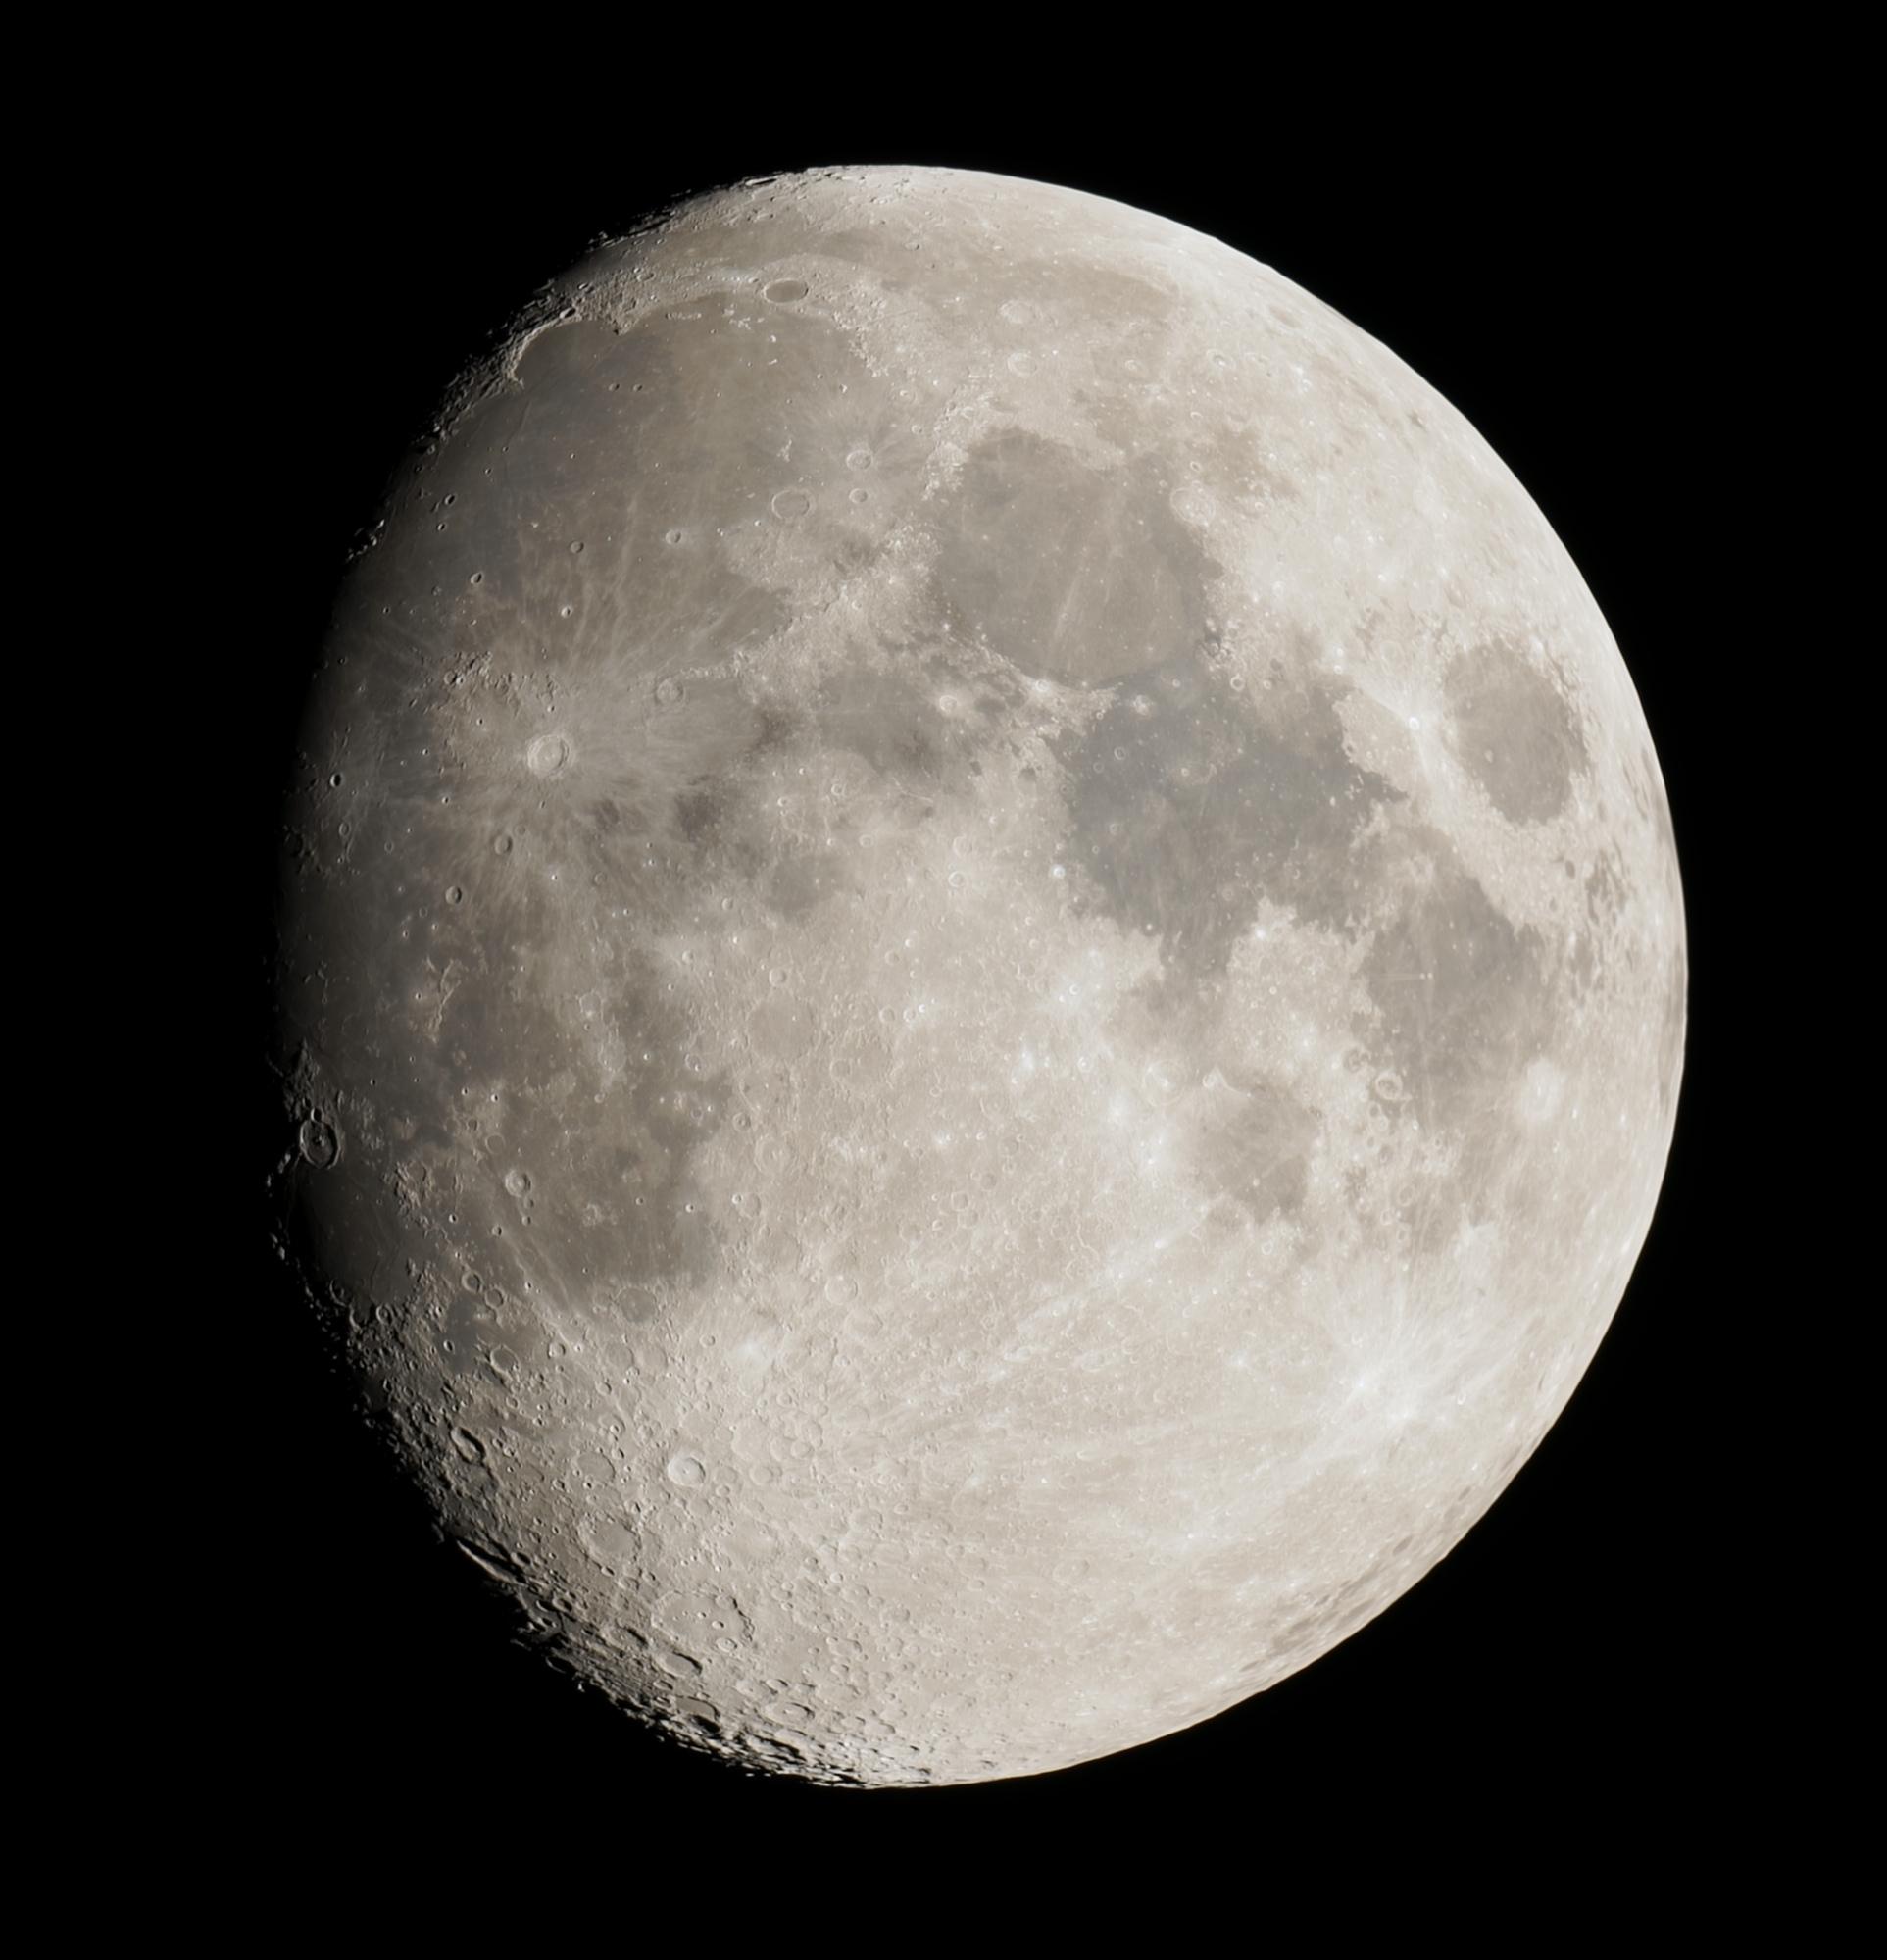 Lune gibbeuse au C8 et Sony A7s(140619, taille100%)